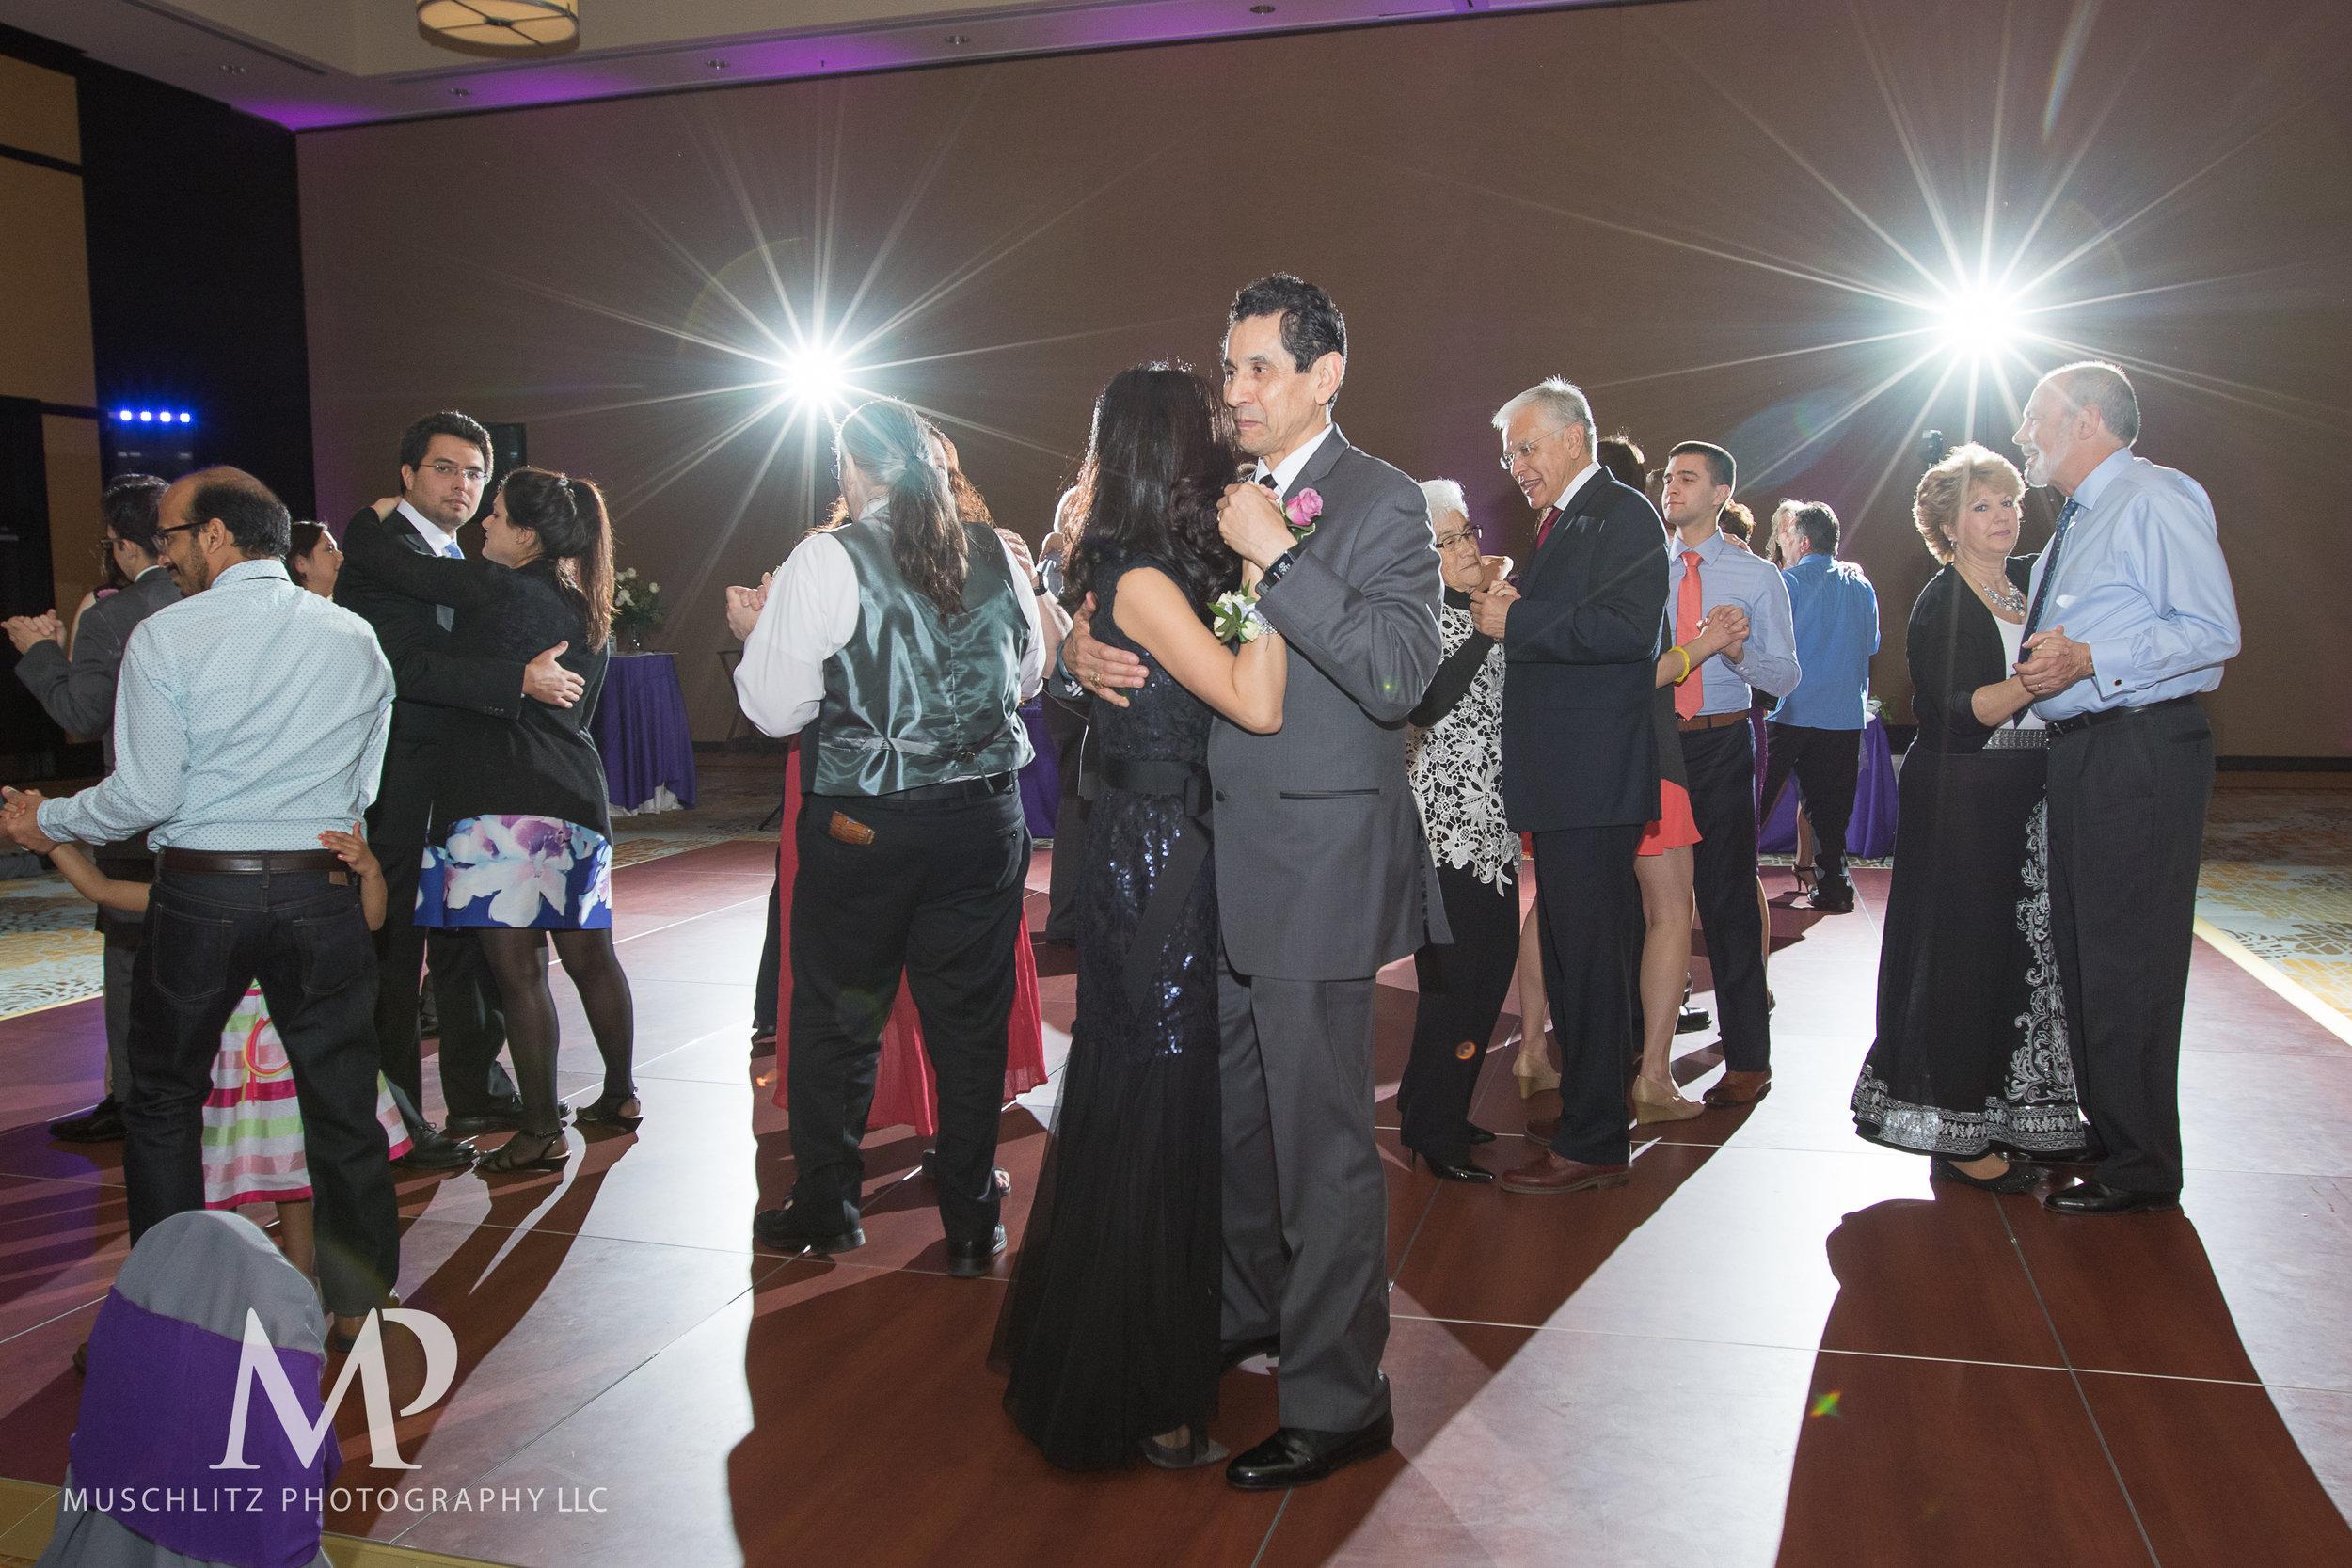 hilton-polaris-wedding-columbus-ohio-muschlitz-photography-071.JPG